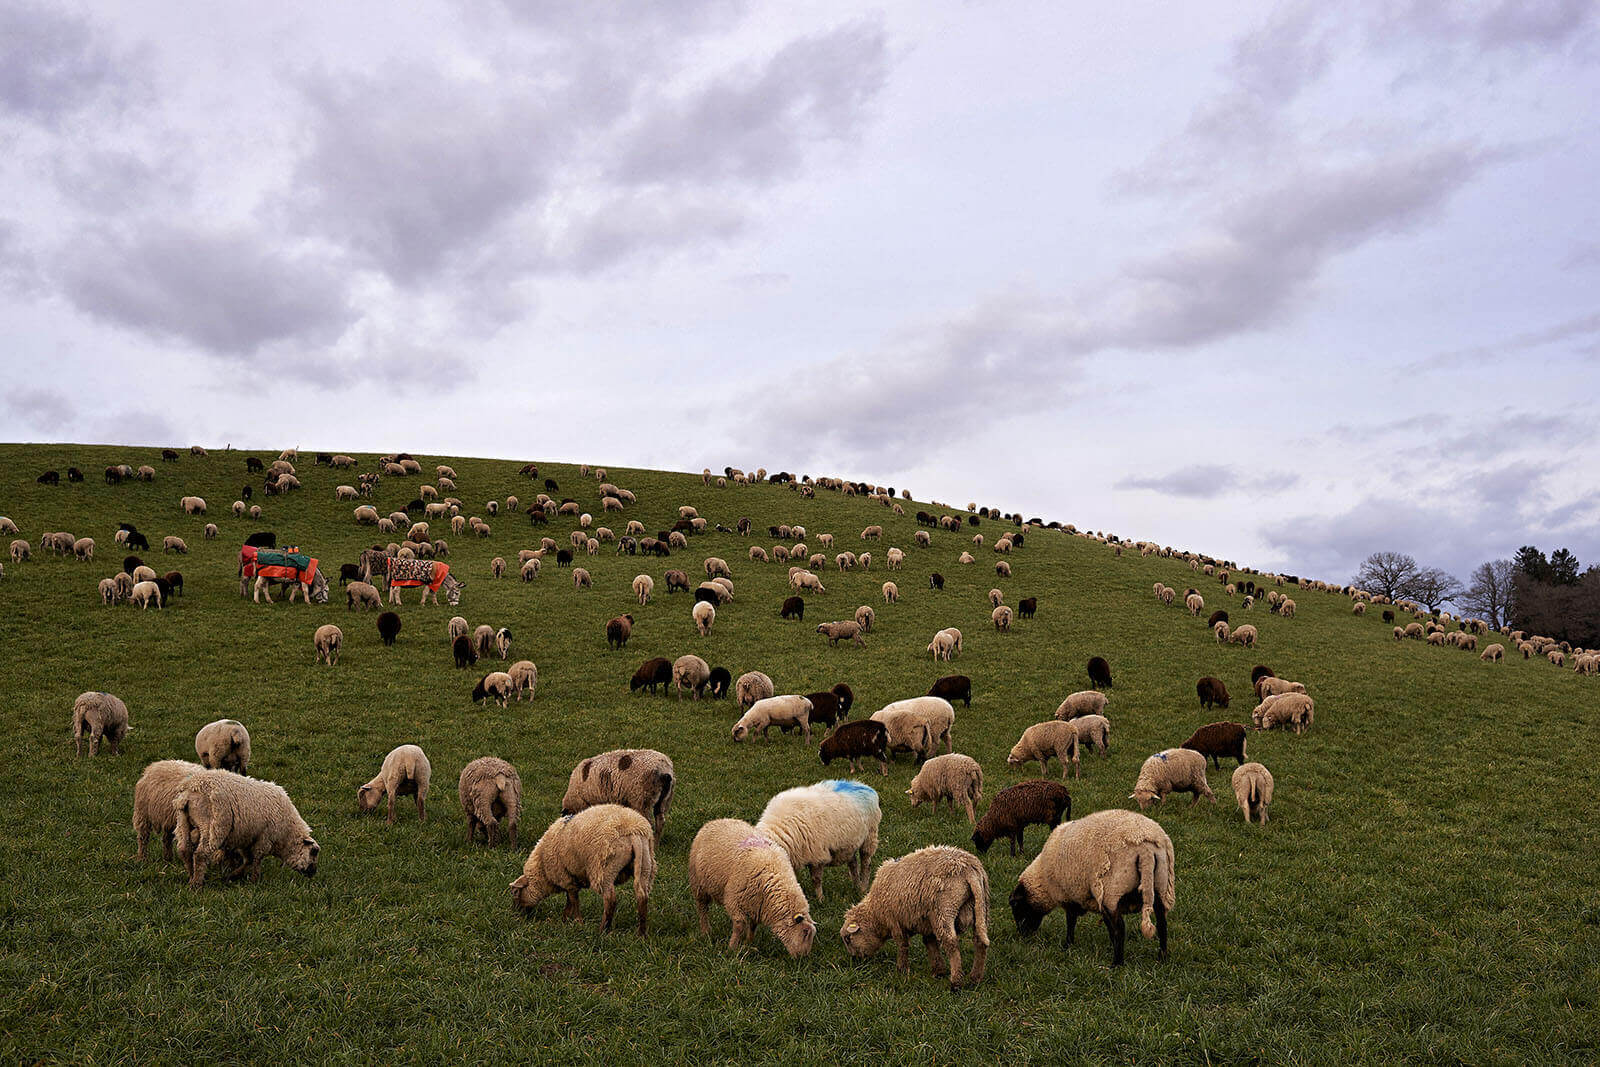 Landwirt_Rudy_Canonica_2641.jpg